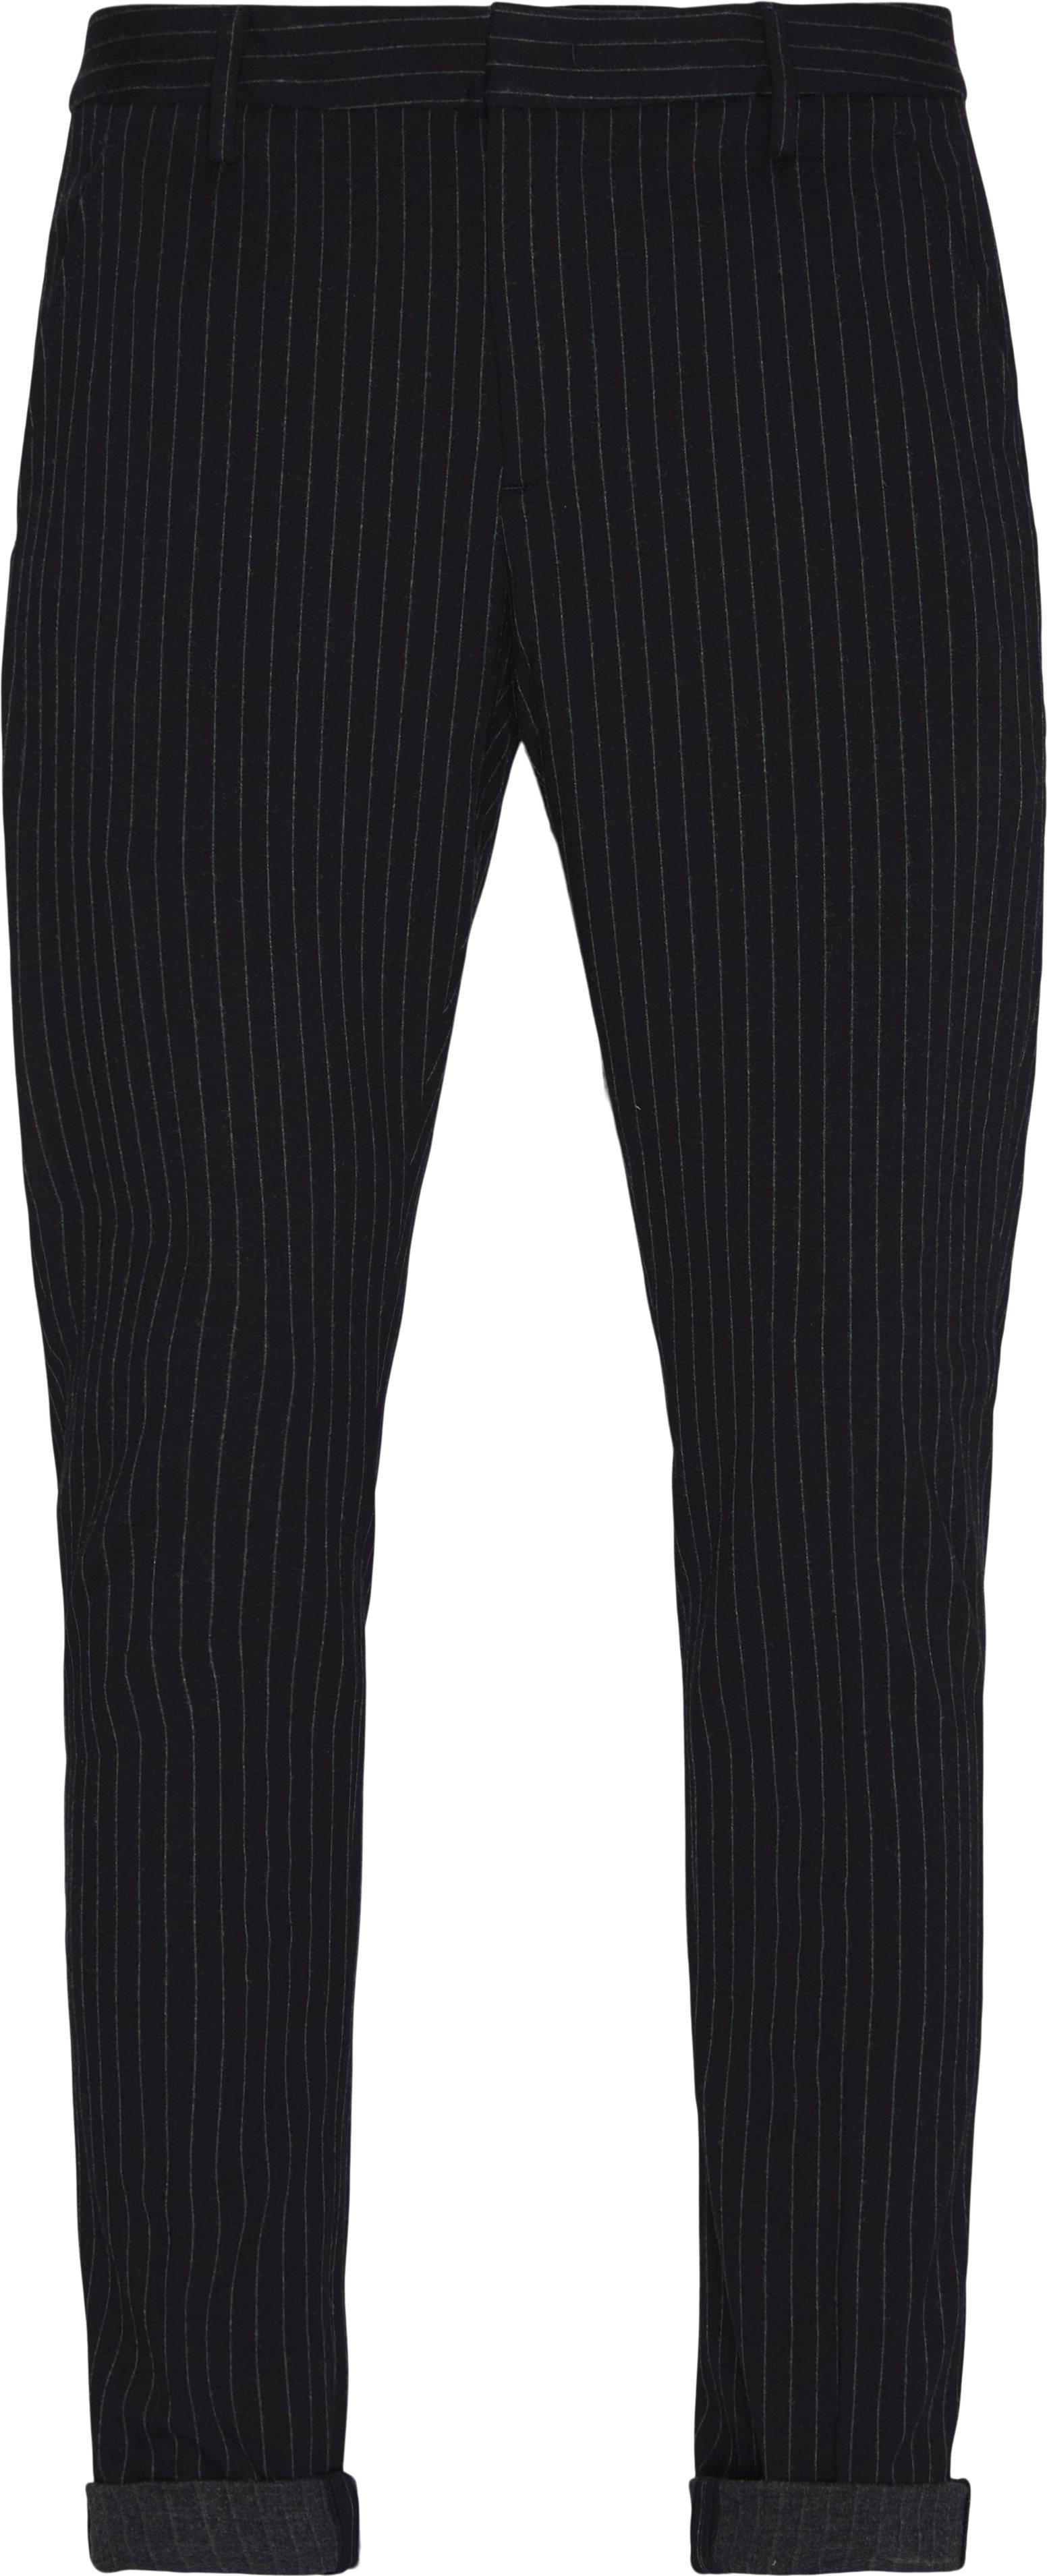 Stripe Pants - Bukser - Slim fit - Blå